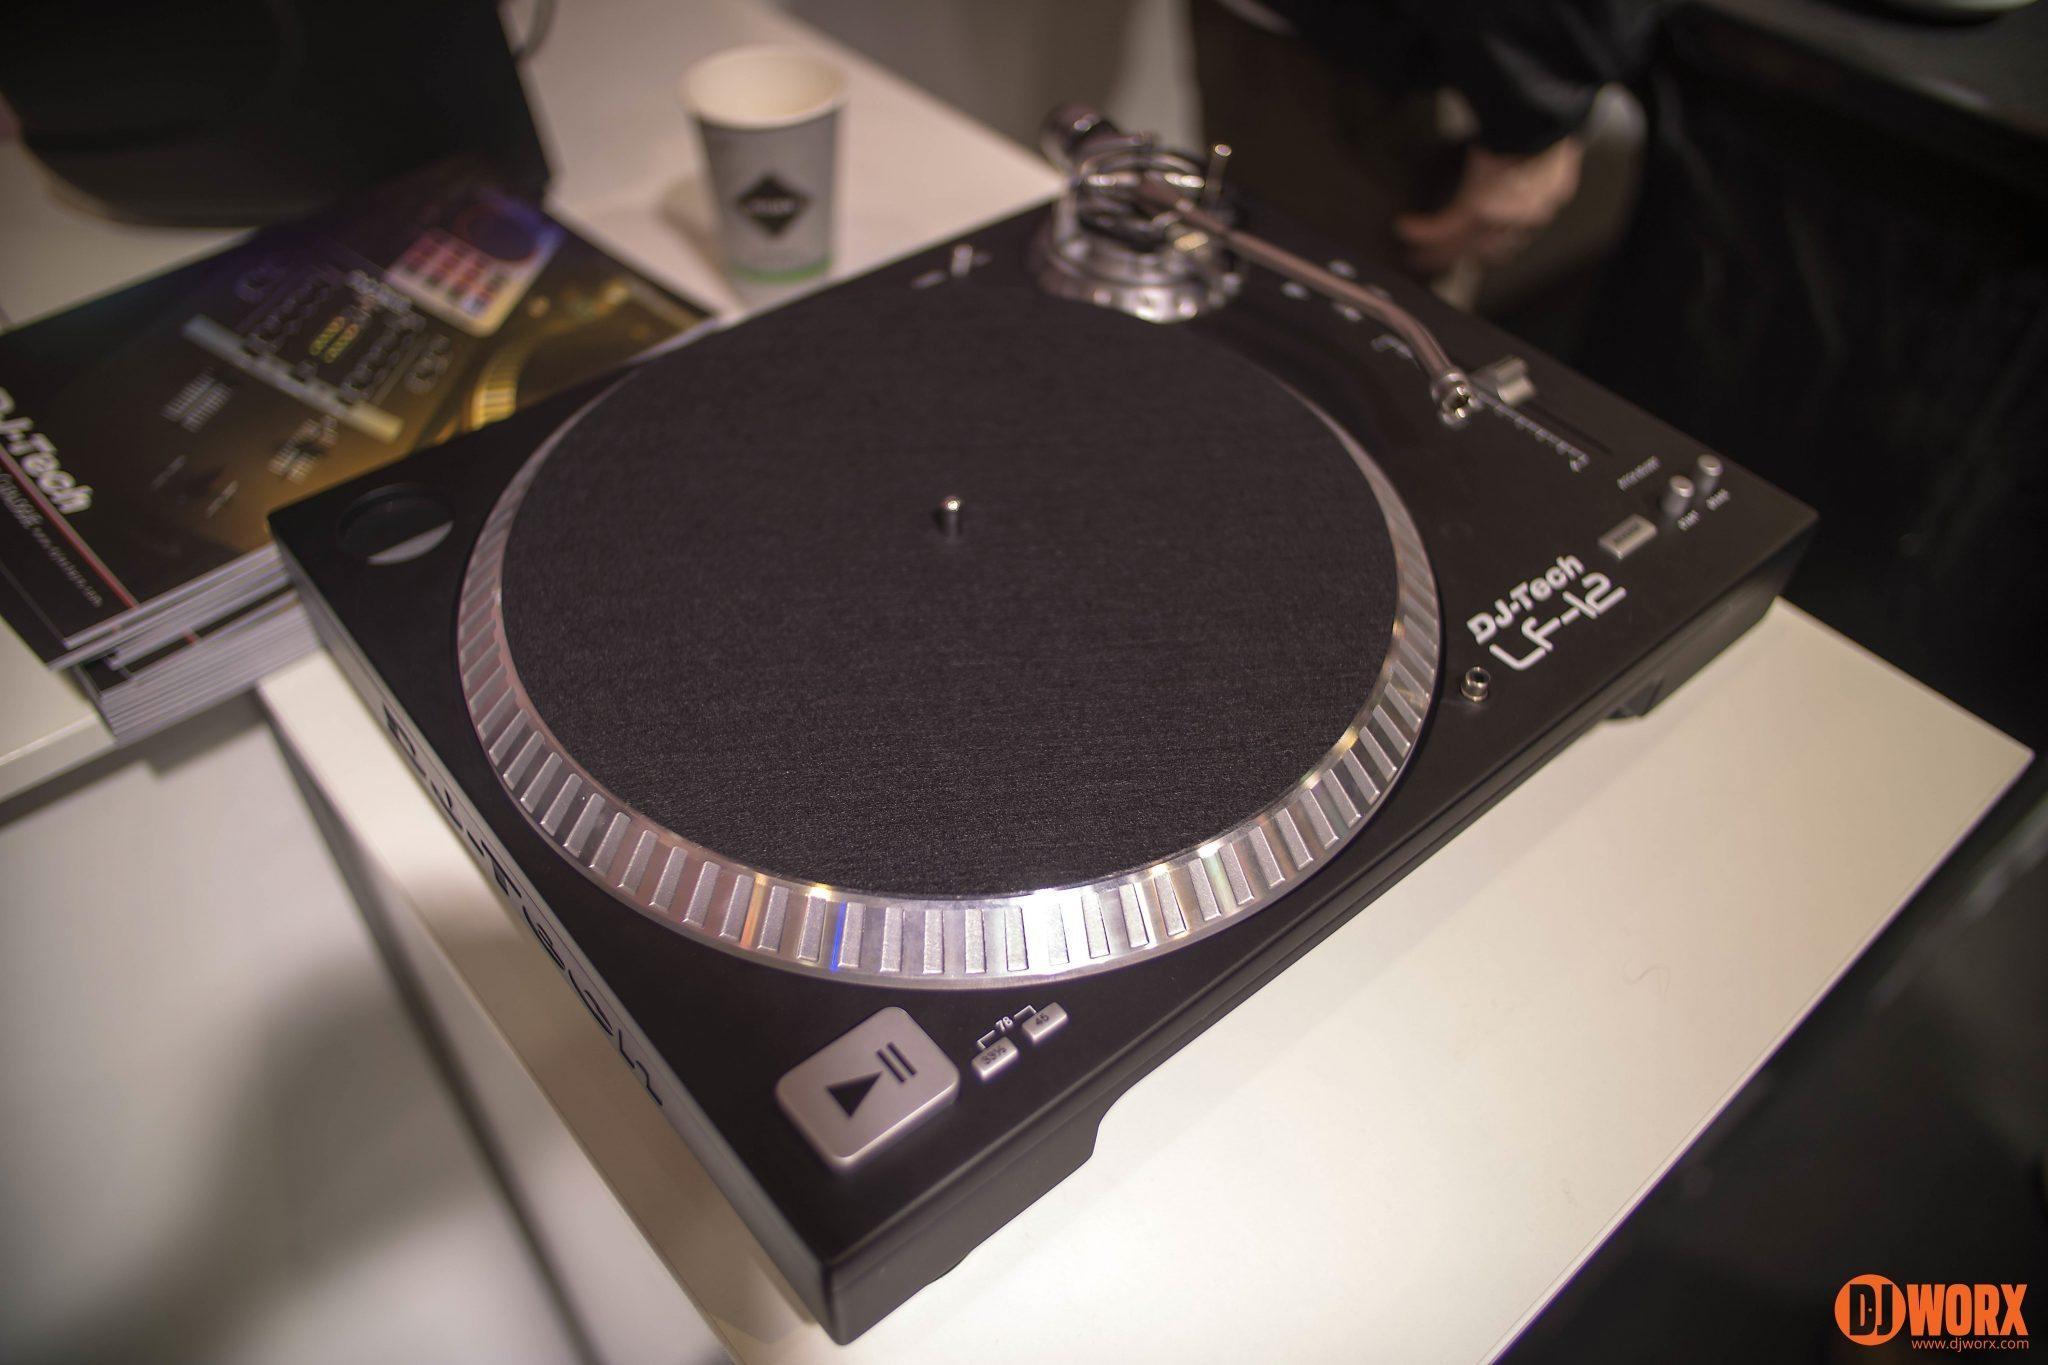 Superb DJ Tech LF 12 Turntable Musikmesse 2014 (3)